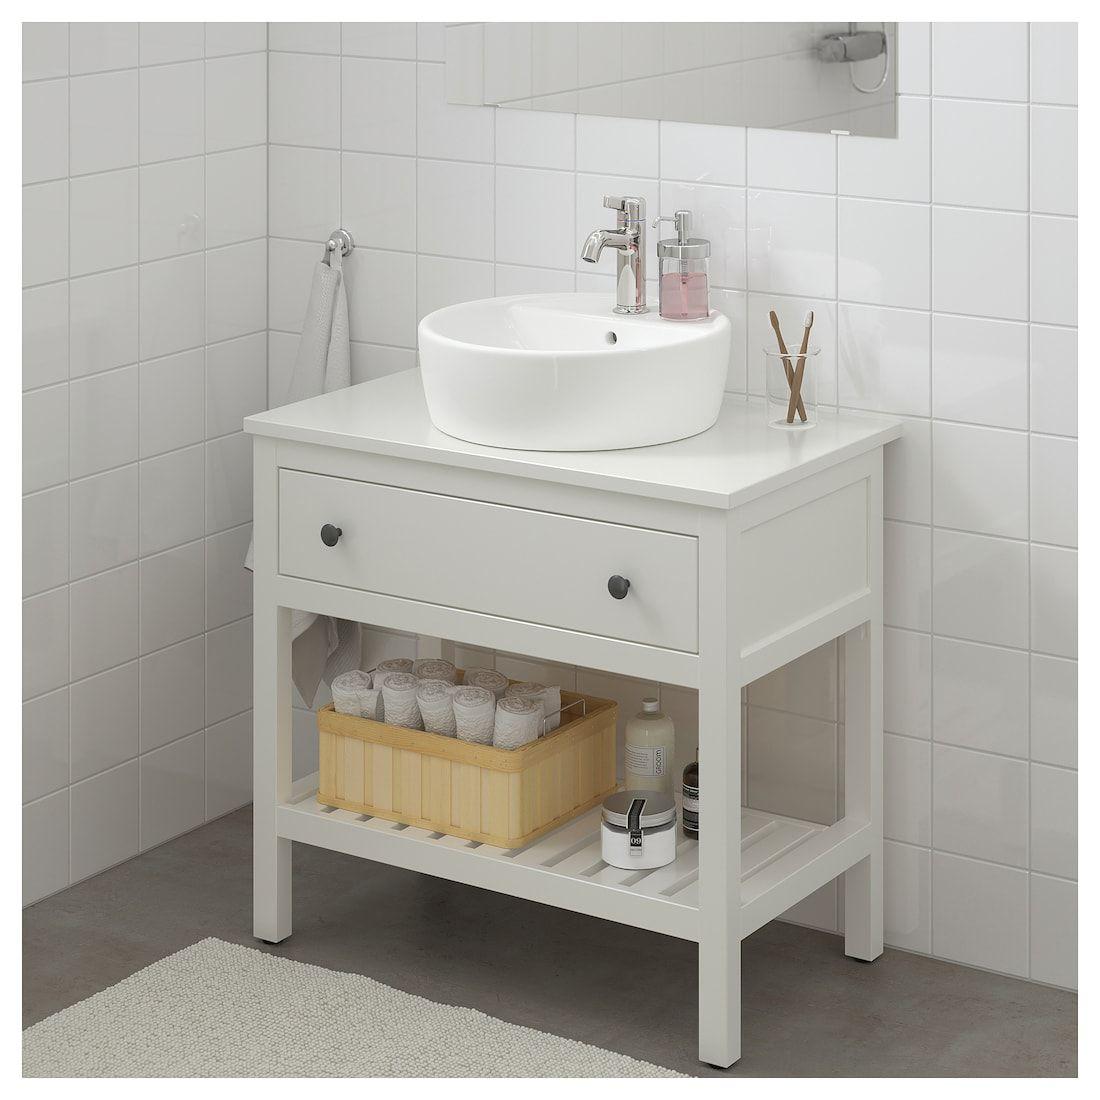 Hemnes Open Sink Cabinet With 1 Drawer White 32 1 4x18 7 8x29 7